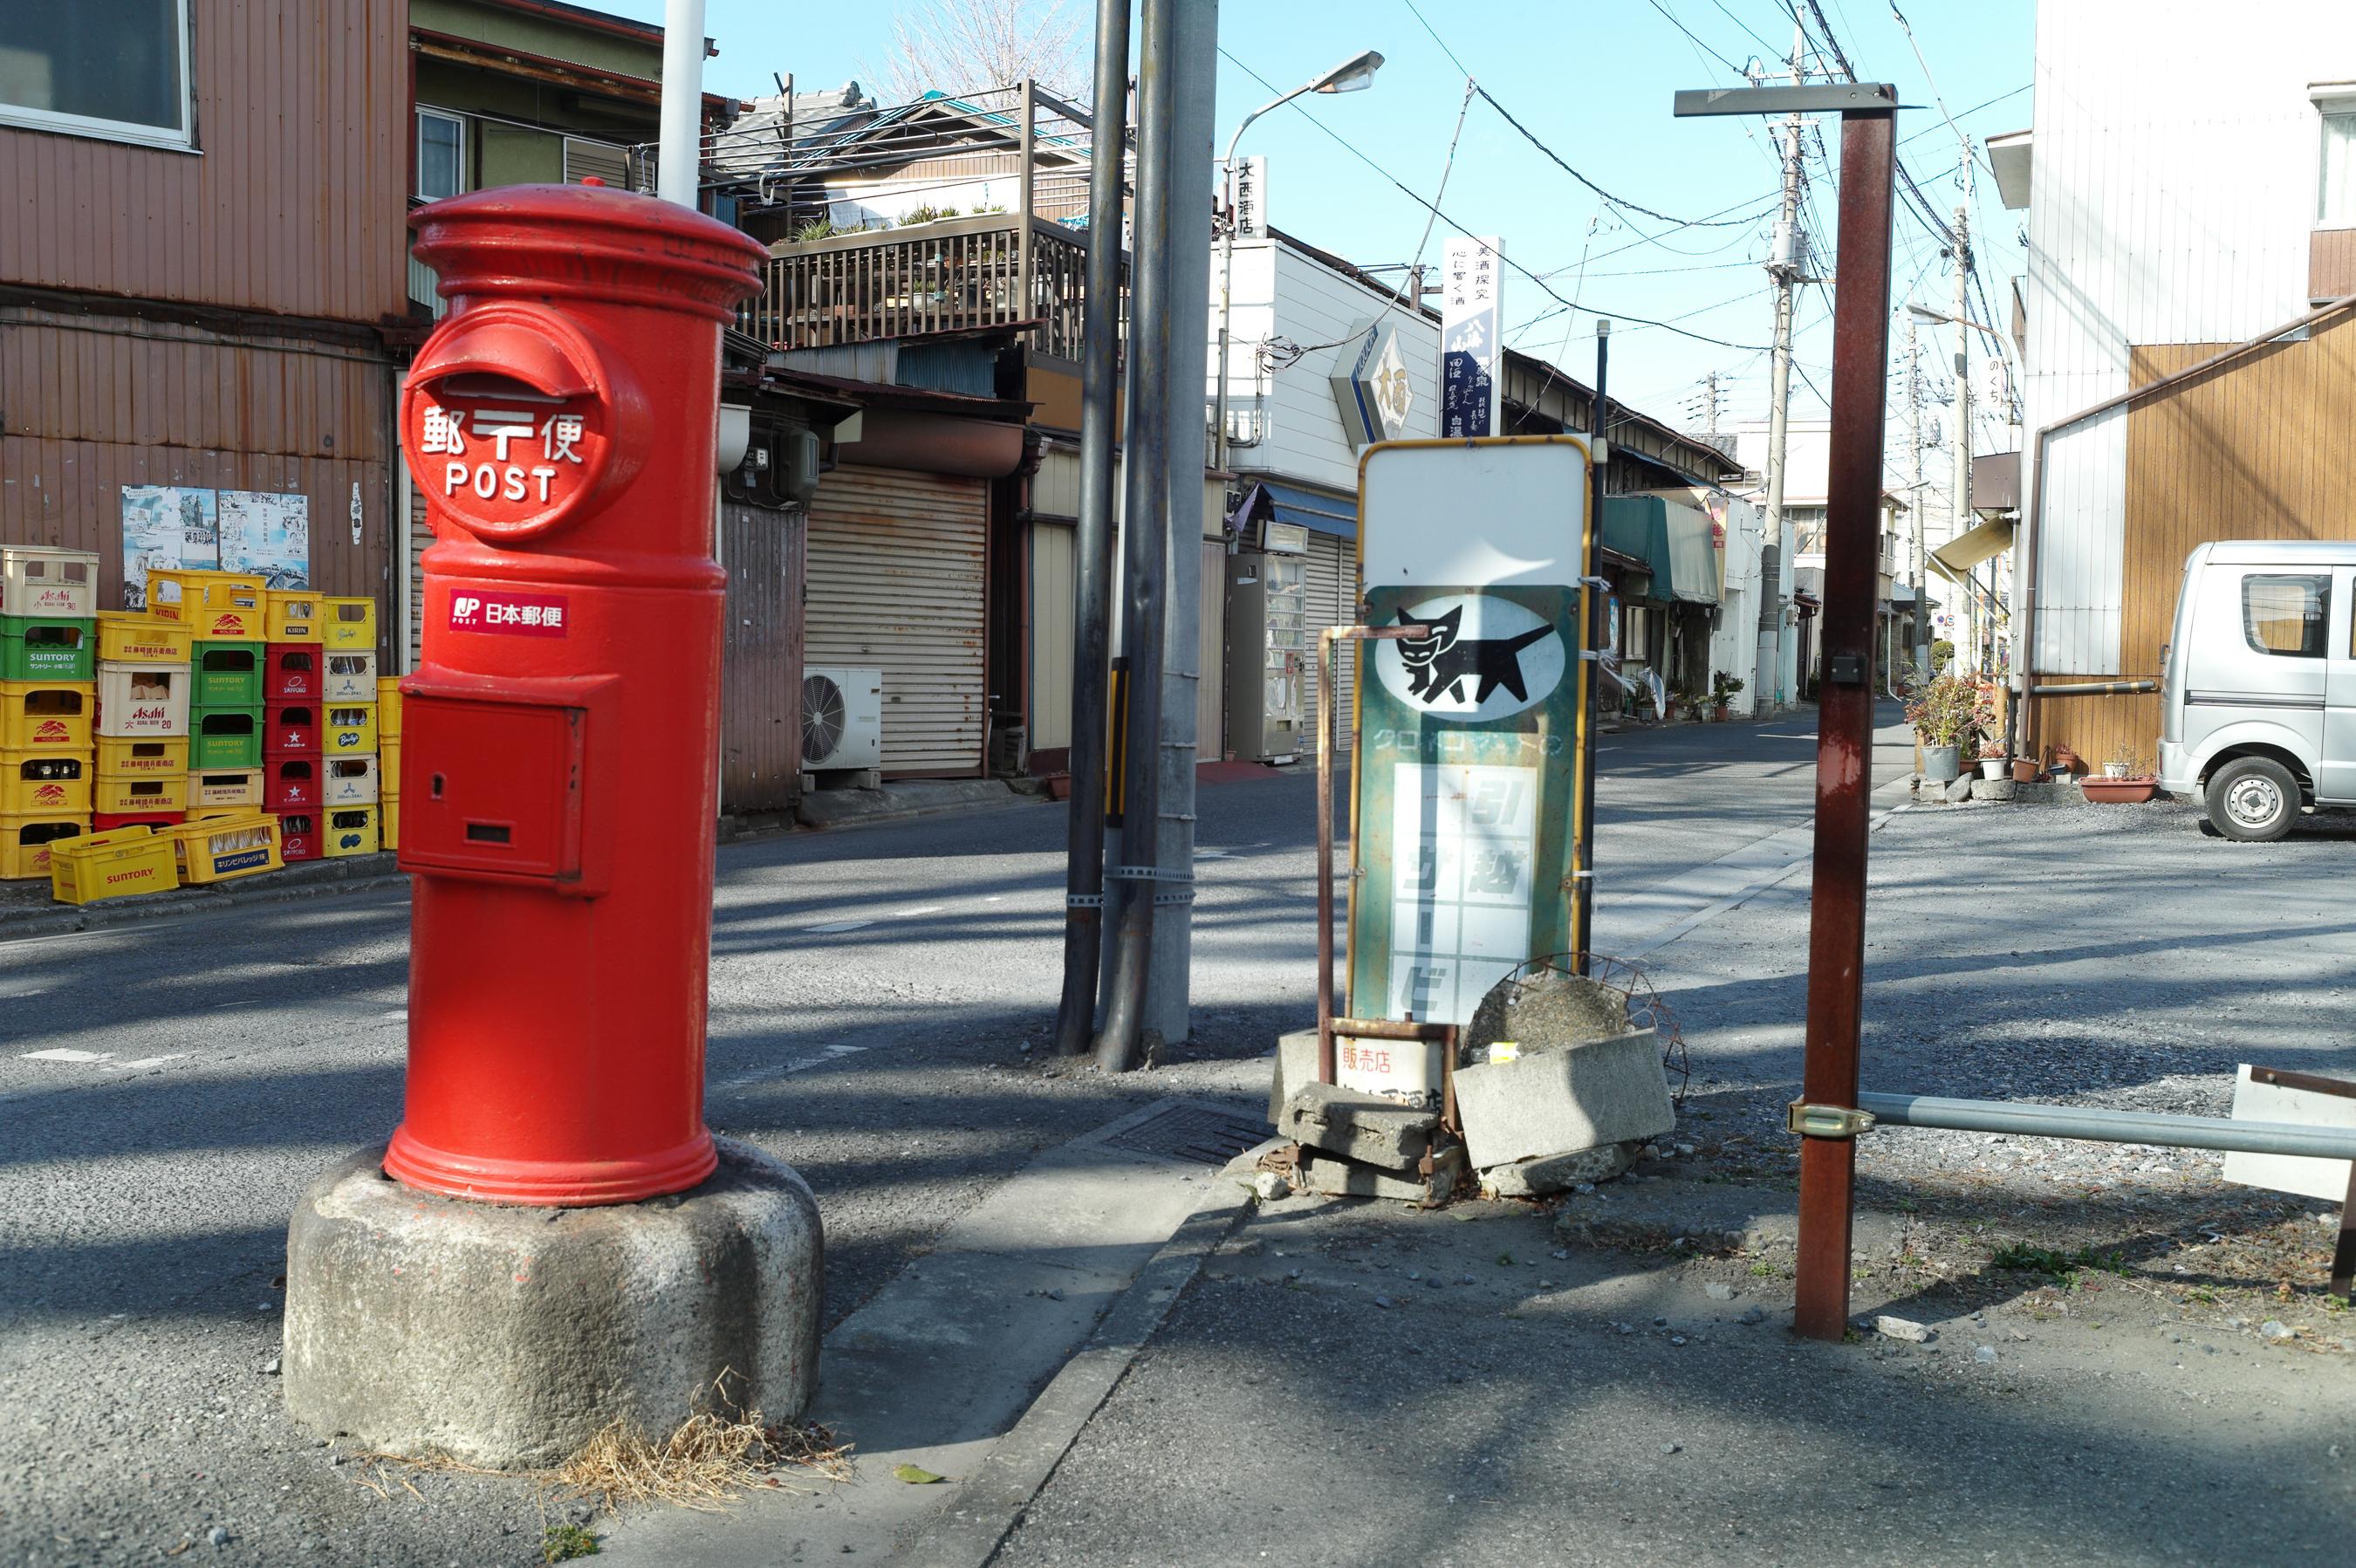 f:id:aoyama-takuro:20180211213317j:plain